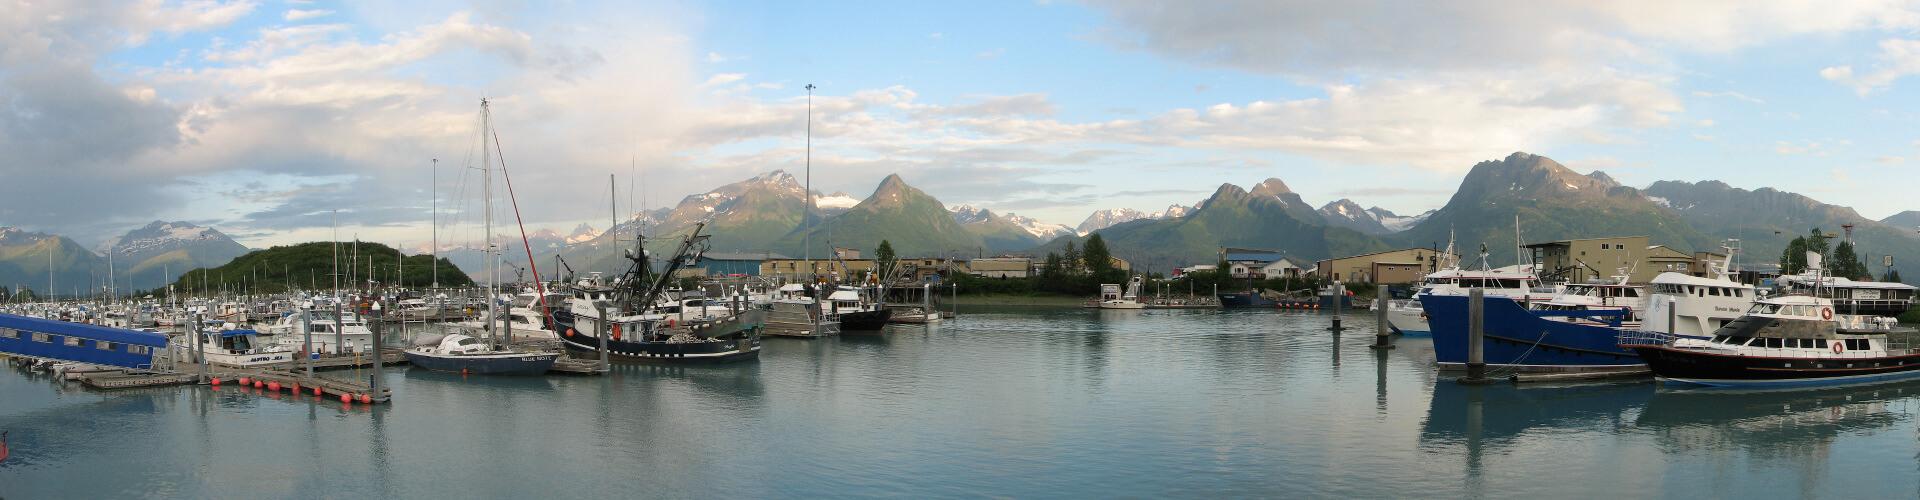 Valdez Alaska view from lodging